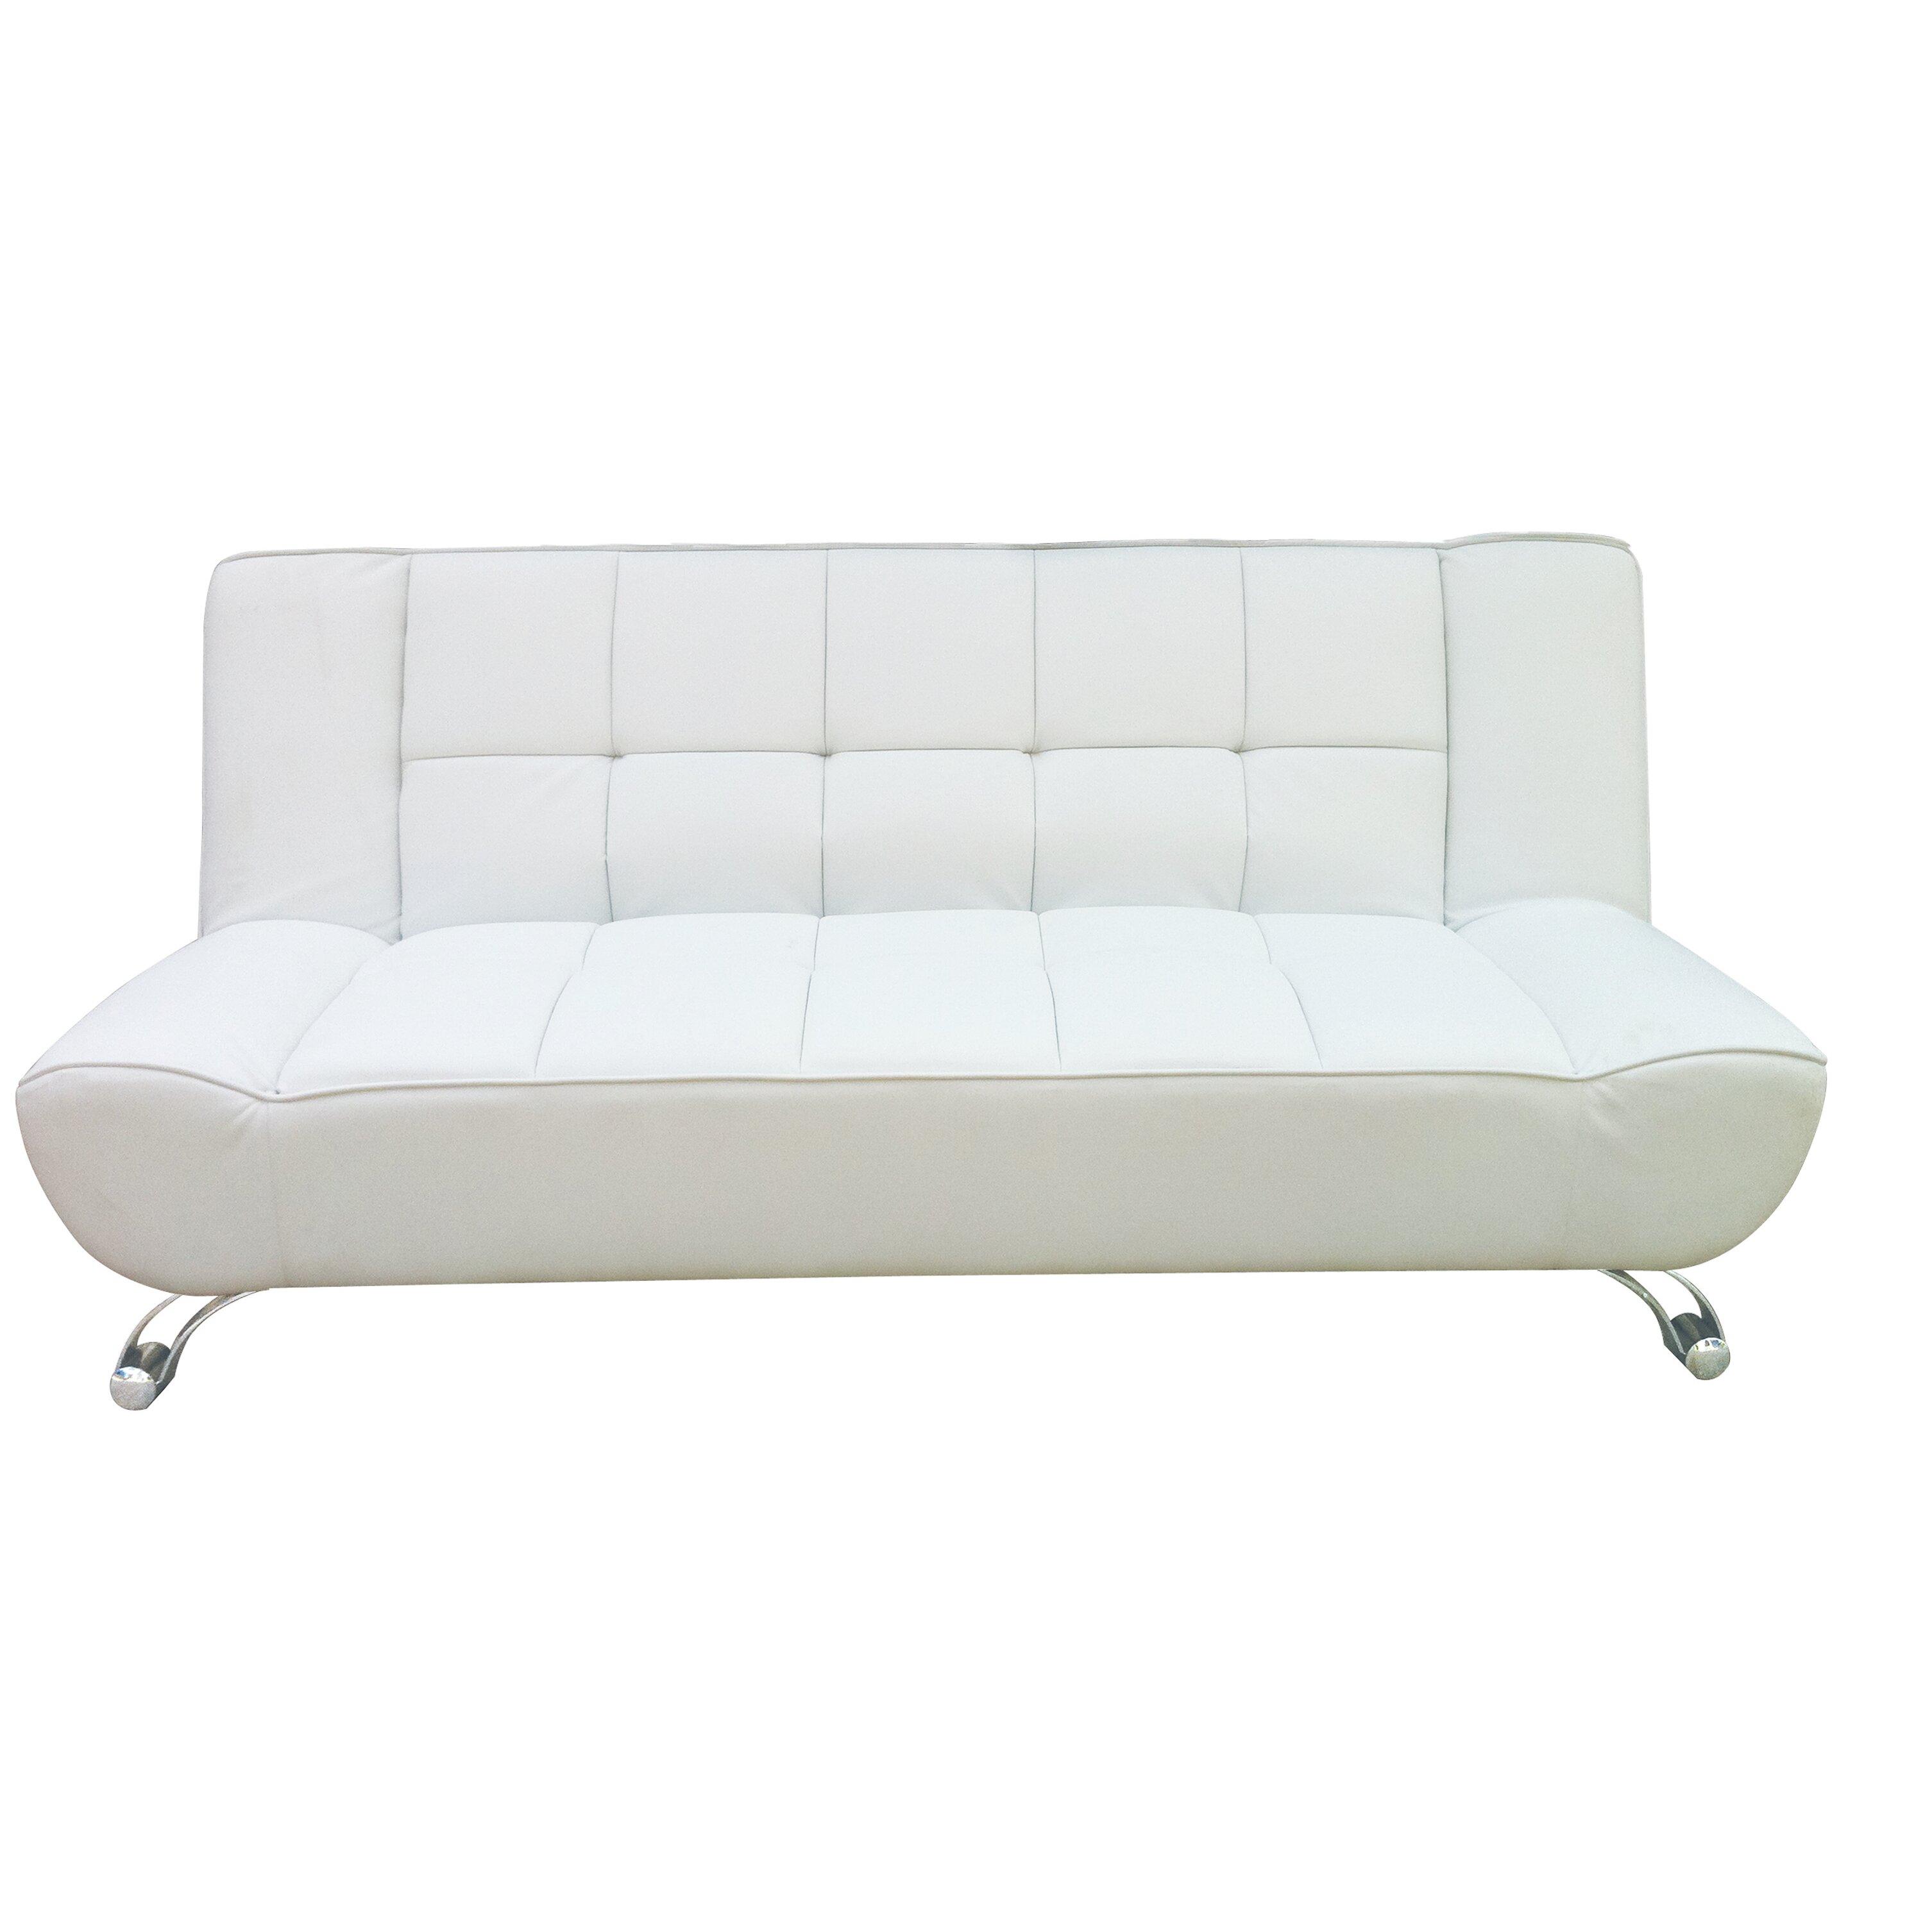 All Home Vogue 3 Seater Clic Clac Sofa Bed & Reviews ...